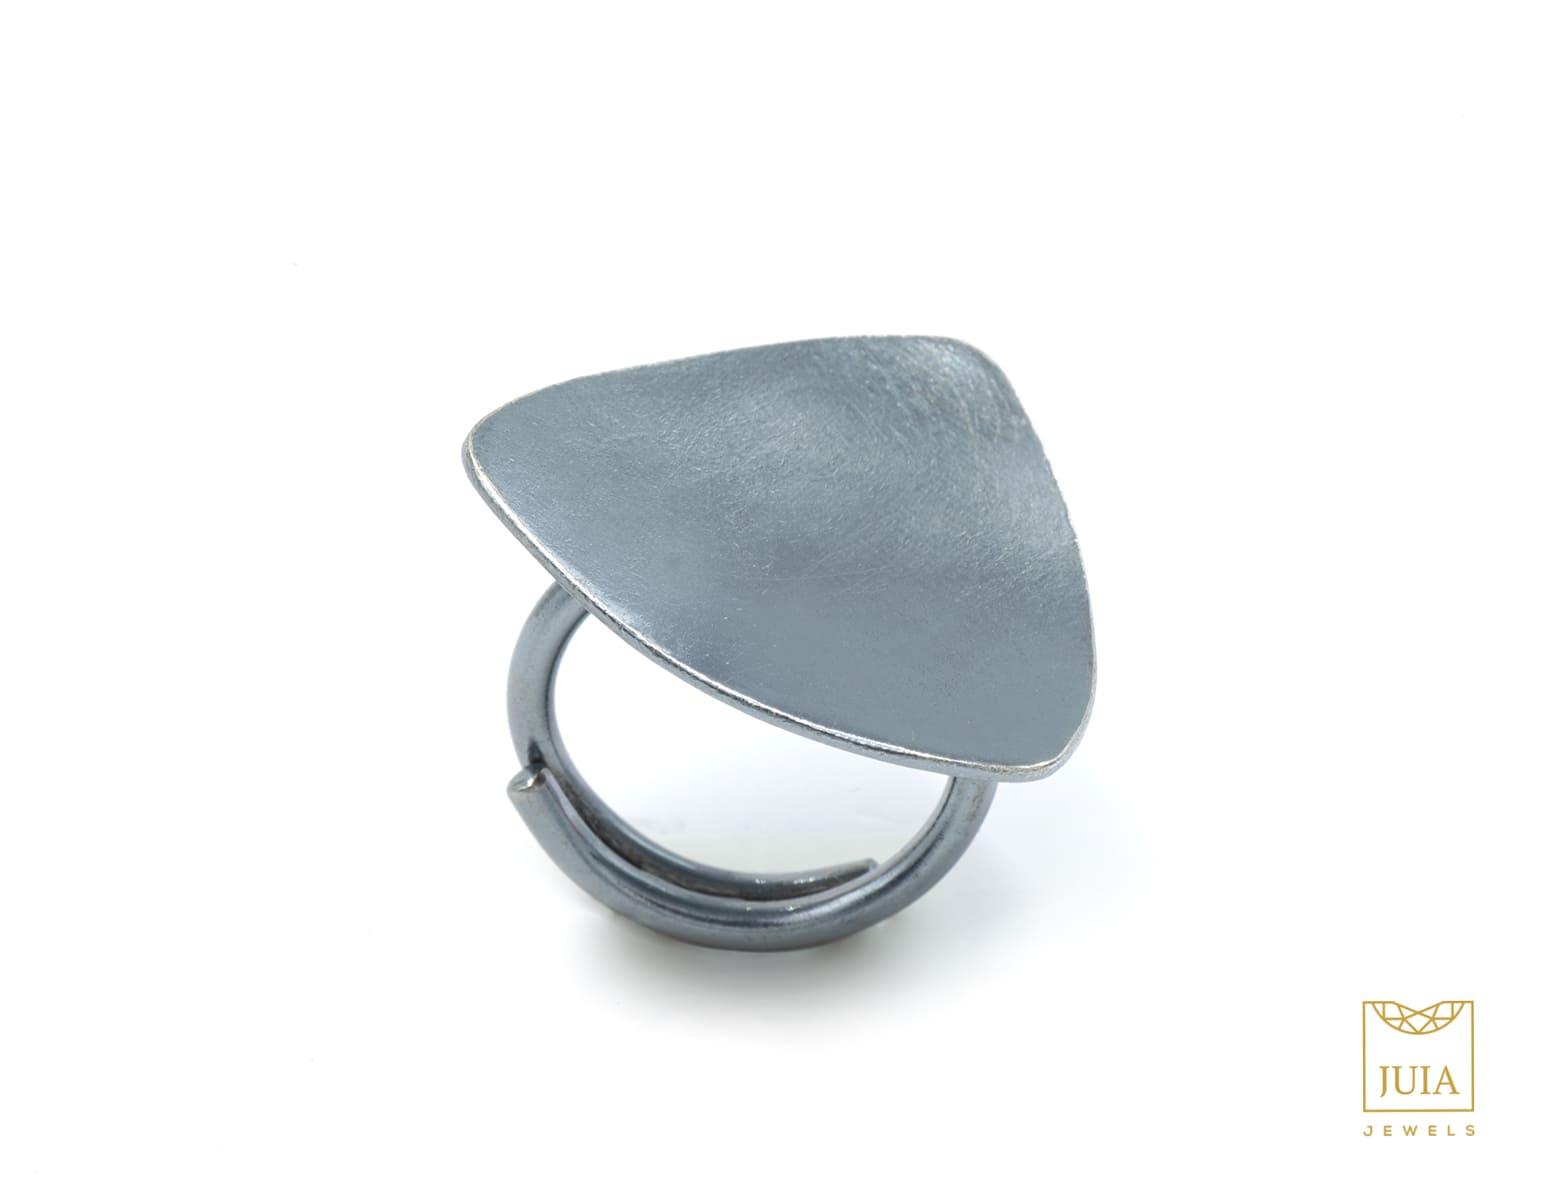 anillo de plata oxidada para aniversario, joyas artesanales, joyas para regalar, juia jewels barcelona, joyasmarket